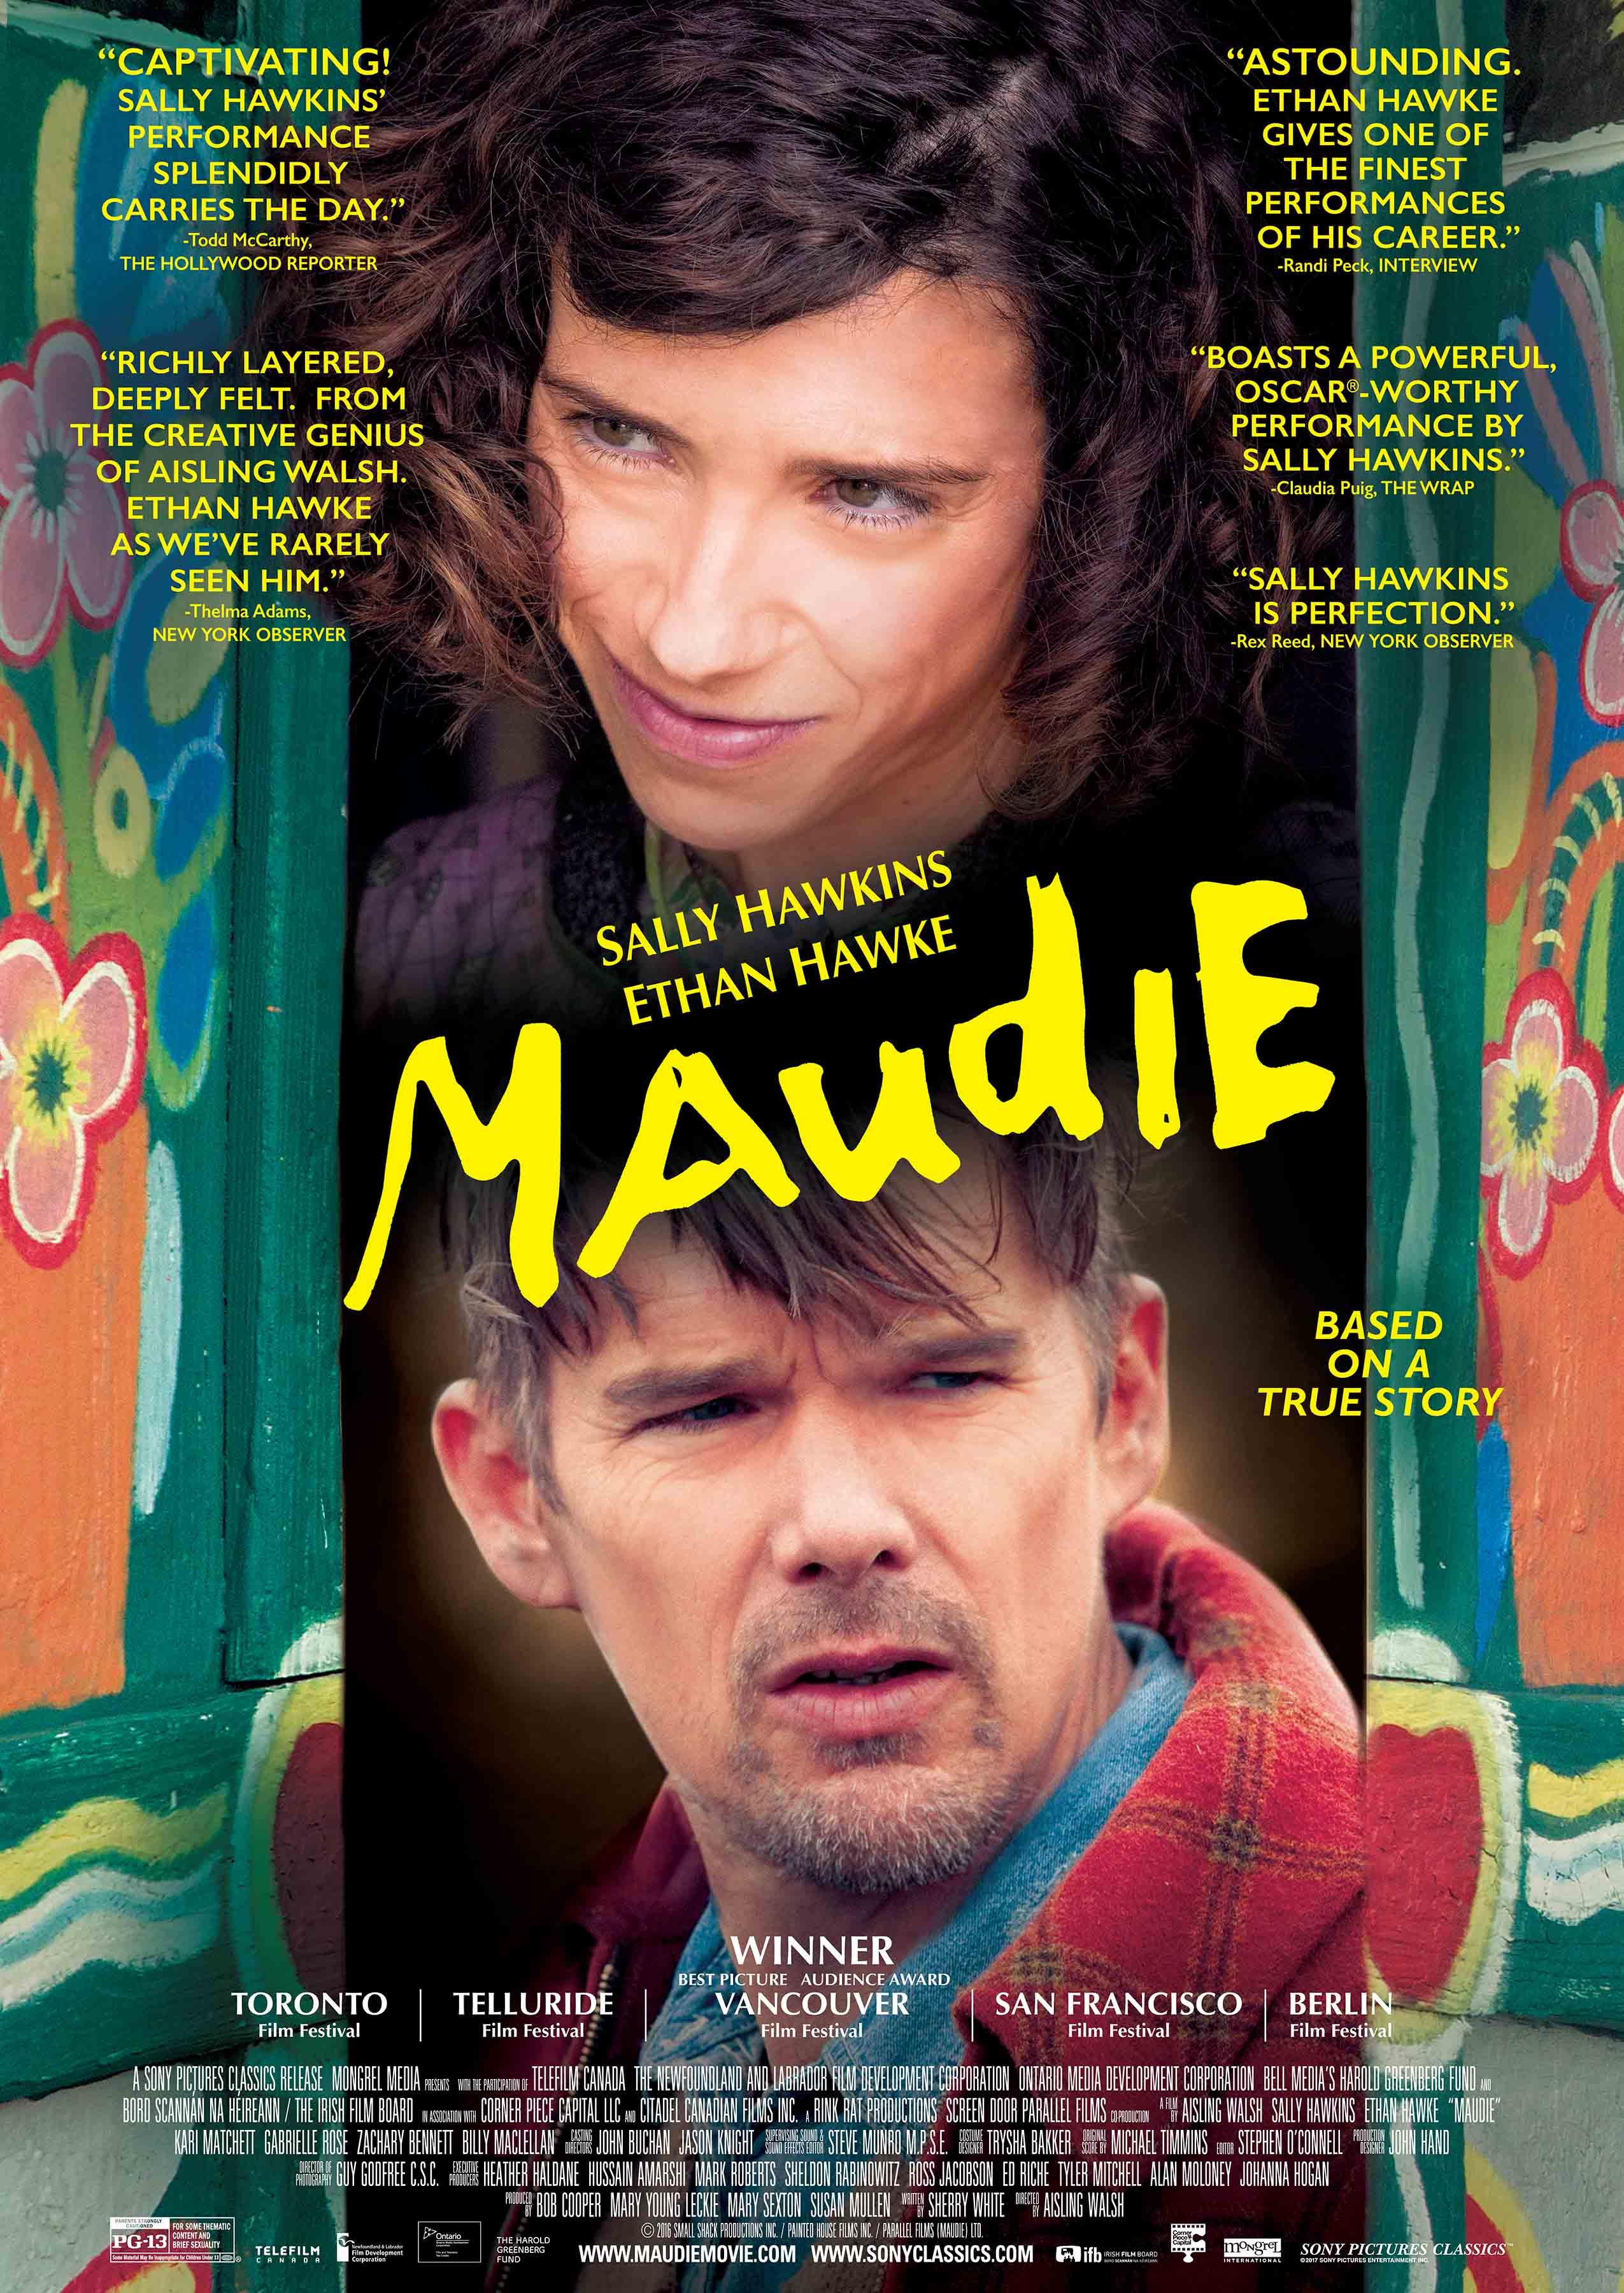 maudie-poster-compressed-1.jpg